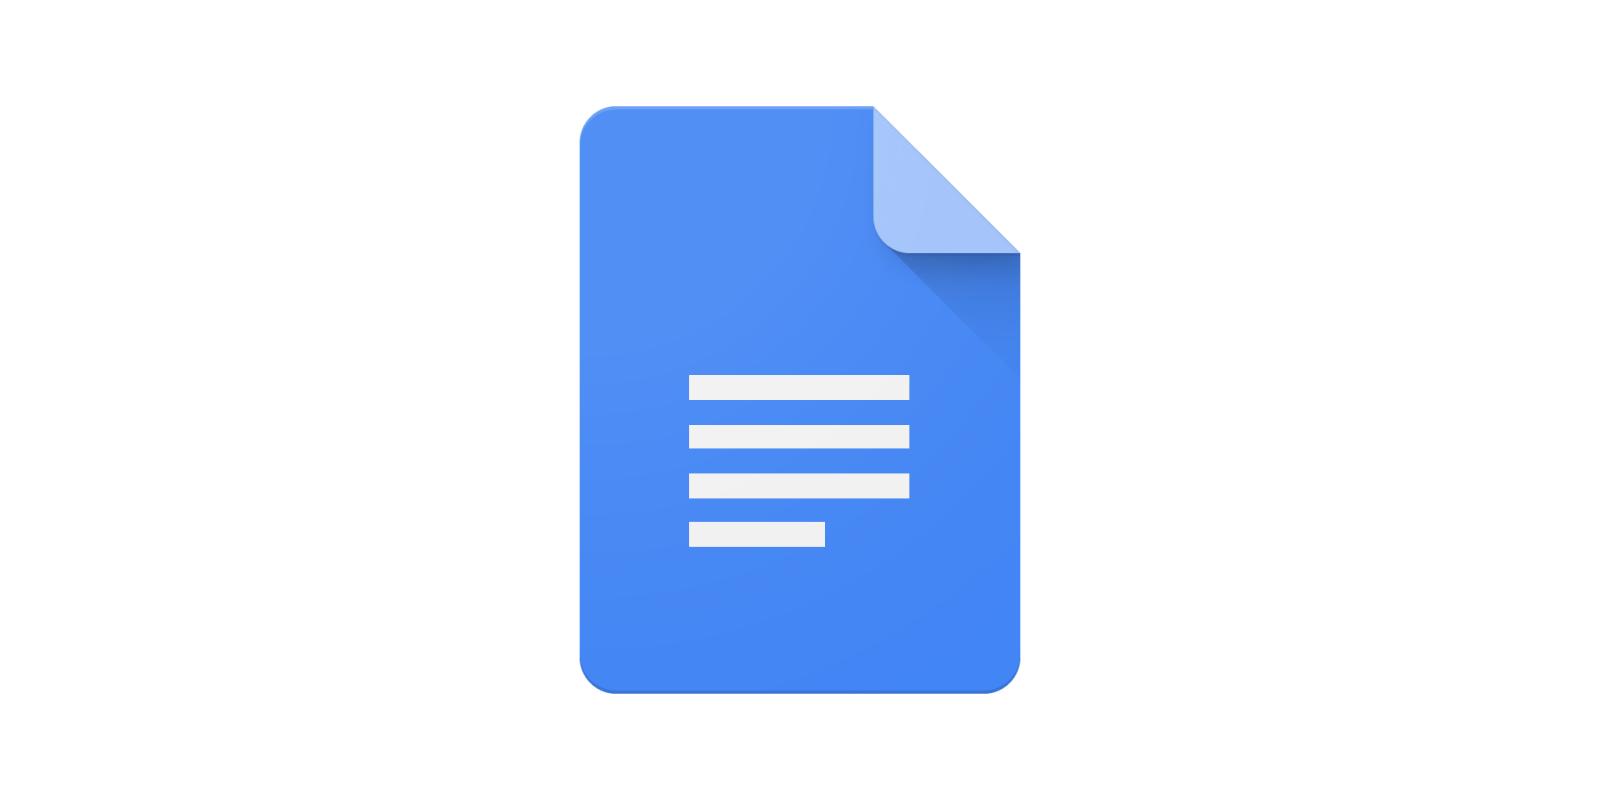 Come si usa Google Docs su Google Drive